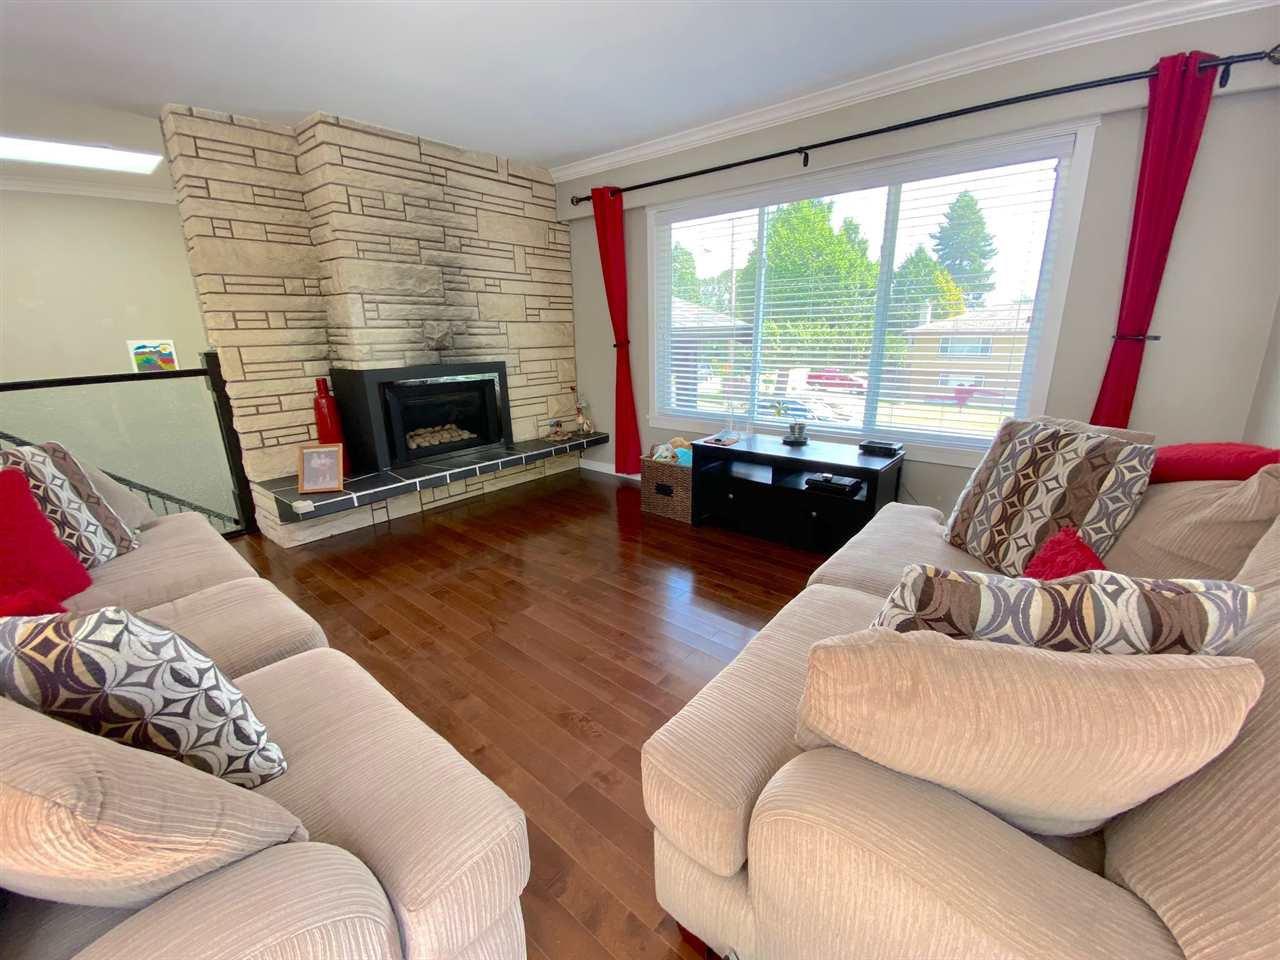 Photo 4: Photos: 555 55A STREET in Delta: Pebble Hill House for sale (Tsawwassen)  : MLS®# R2481635